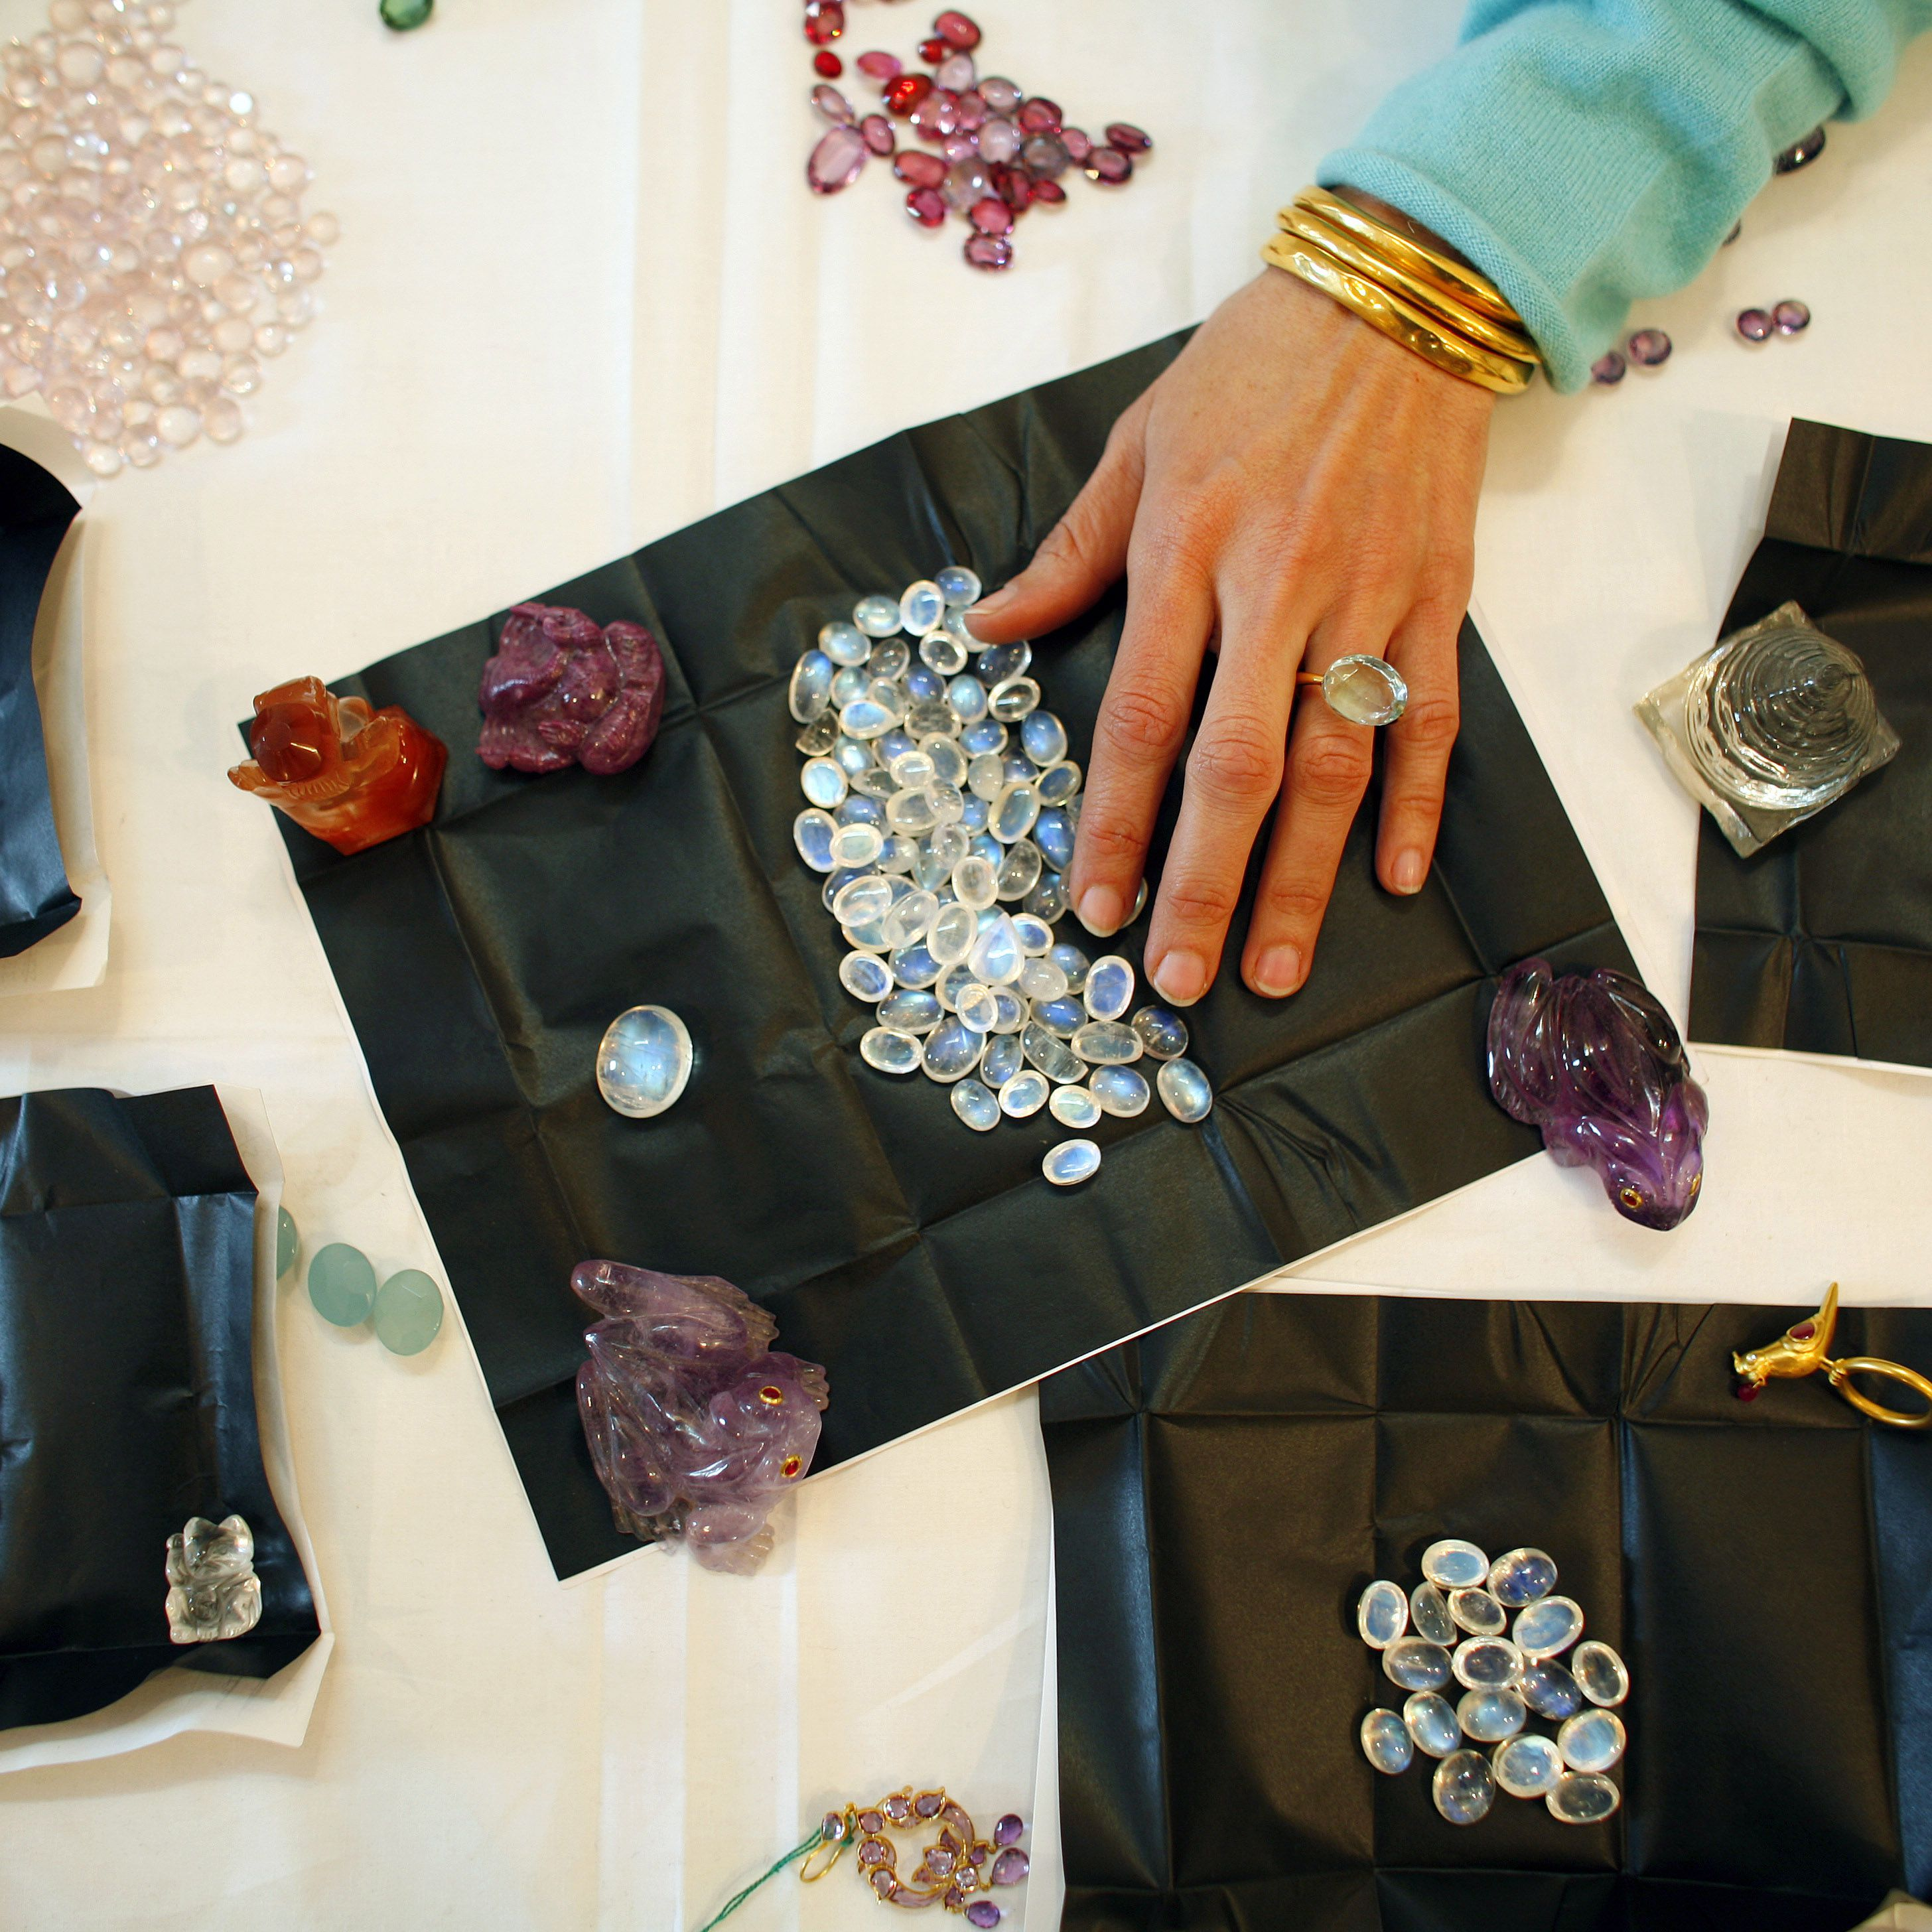 How to Buy Gemstones in India